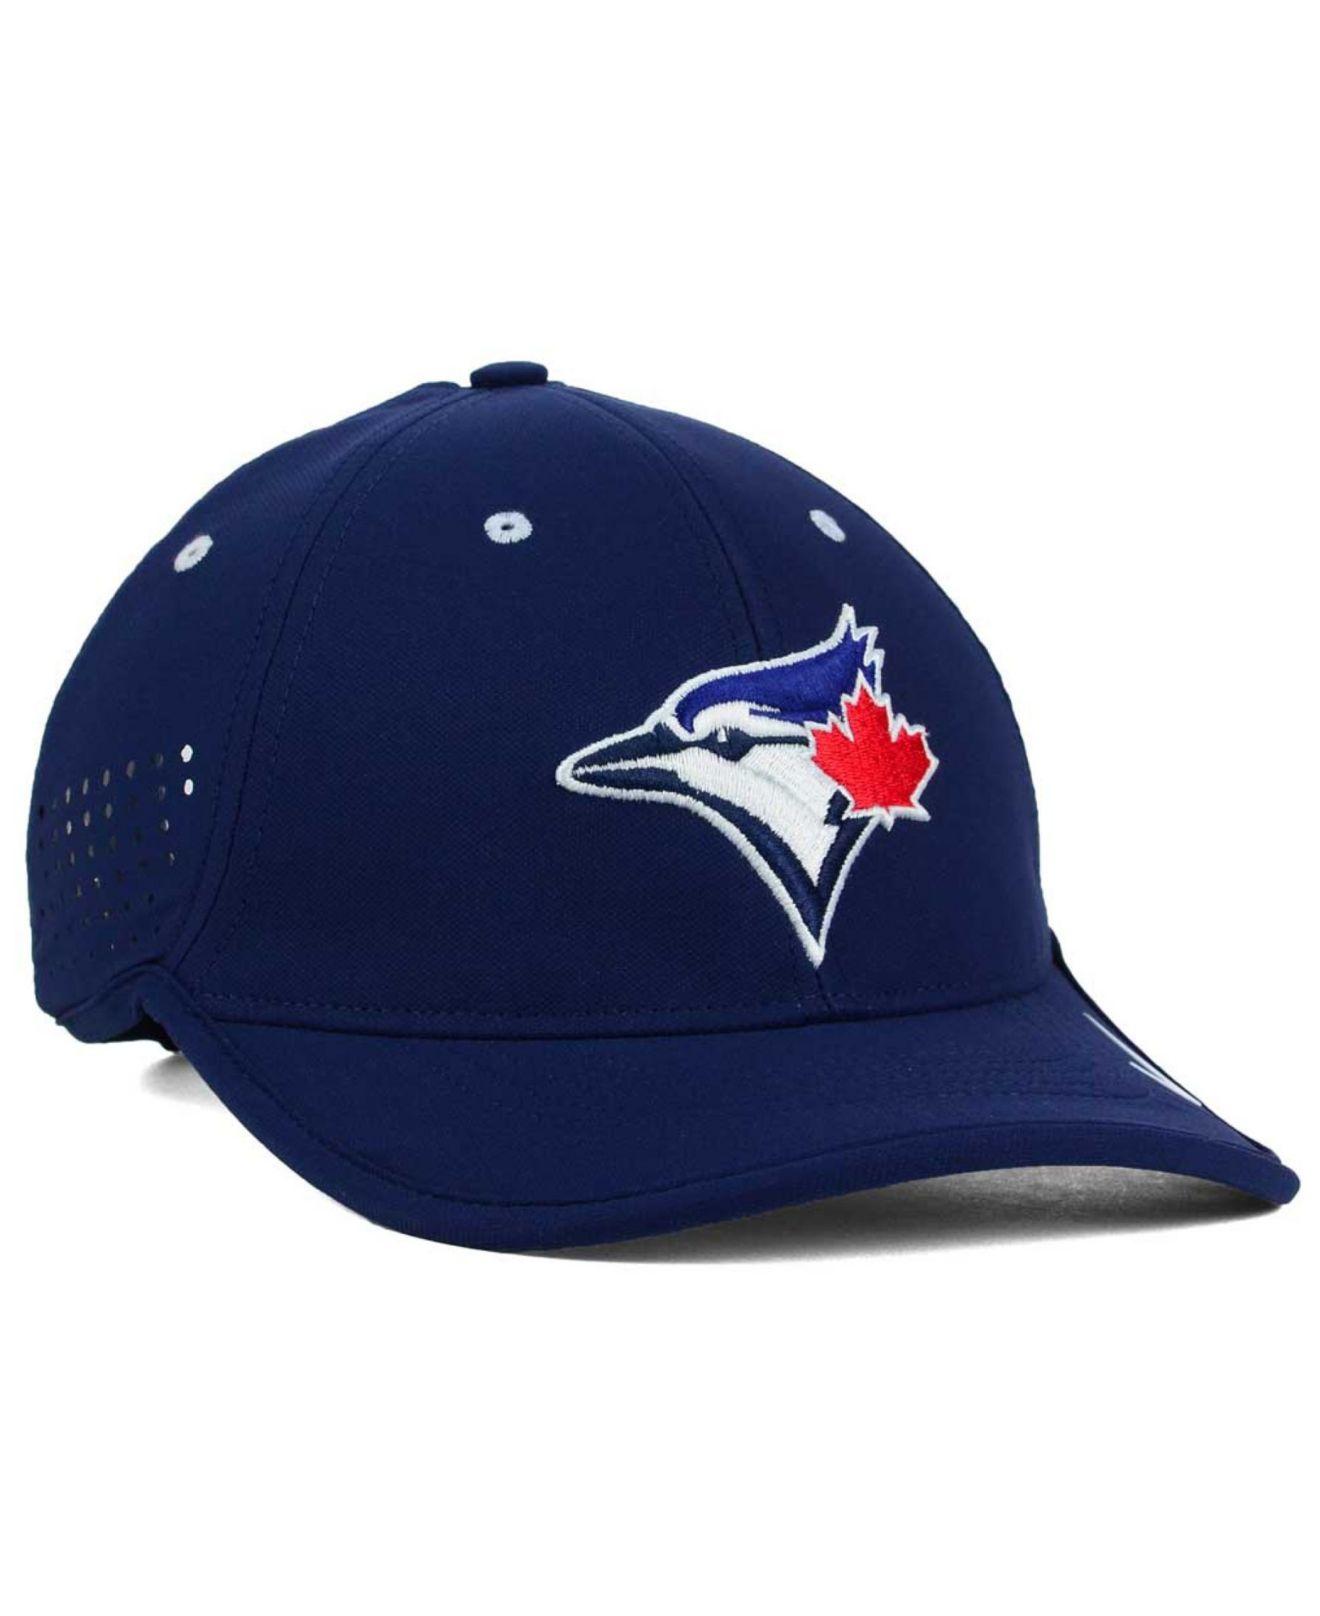 42a7e810661 ... canada lyst nike toronto blue jays vapor swoosh adjustable cap in red  for men 1f4d8 9caec